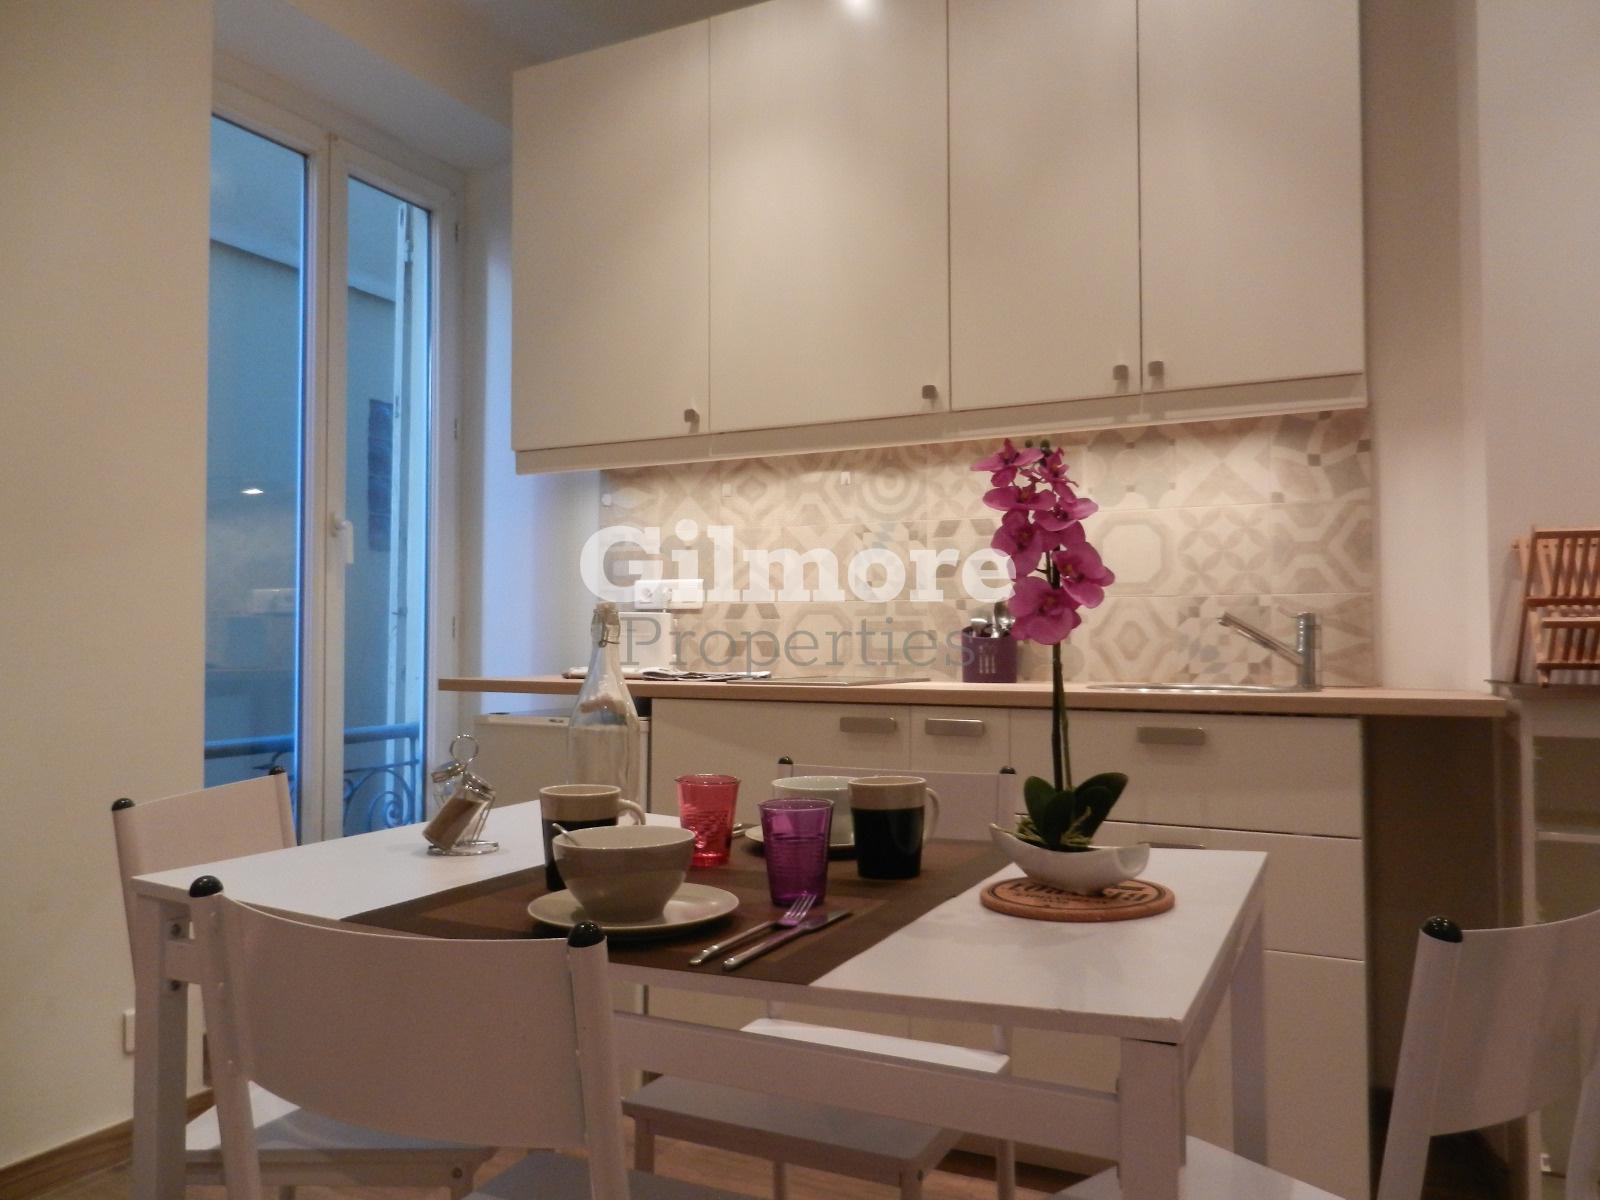 Offres de location Appartement Nice (06100)